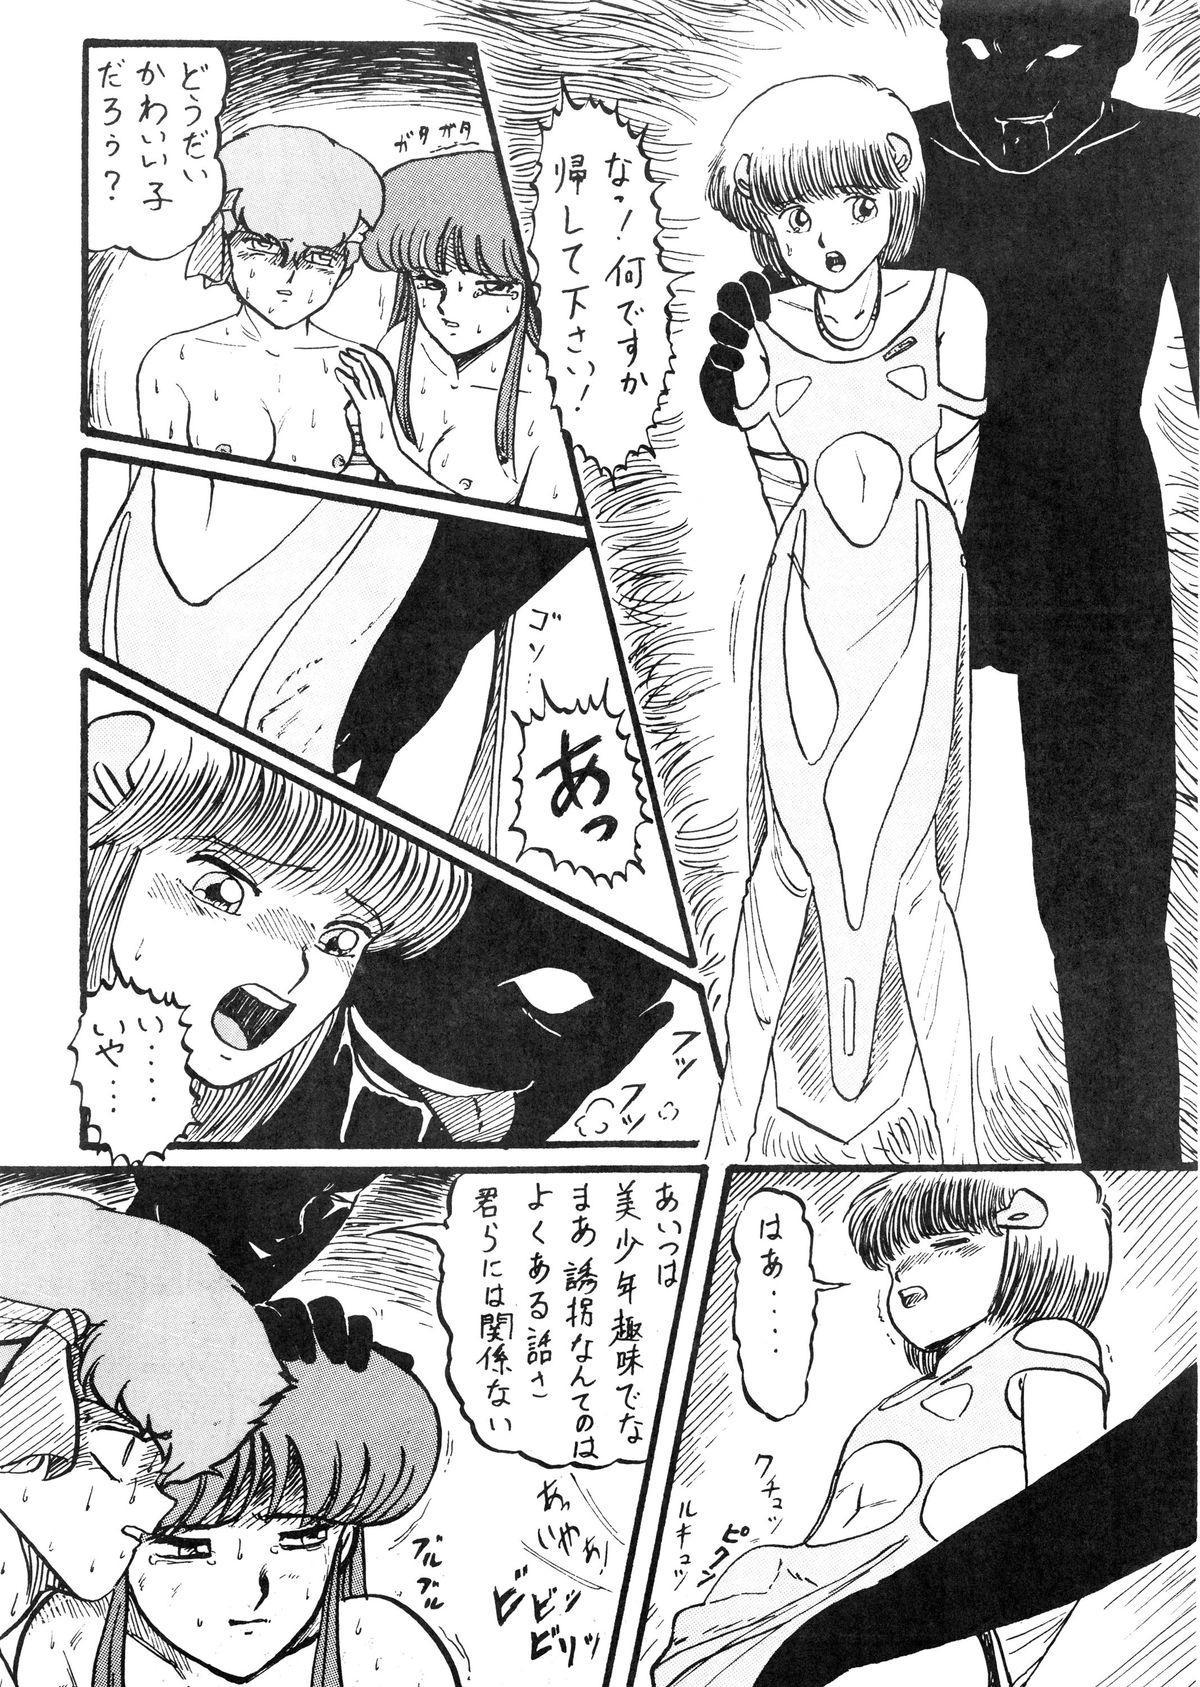 [Secret Society Chi (Iijima Mario)] Kai II - Iijima Mario Kojin-shi - (Various) 37